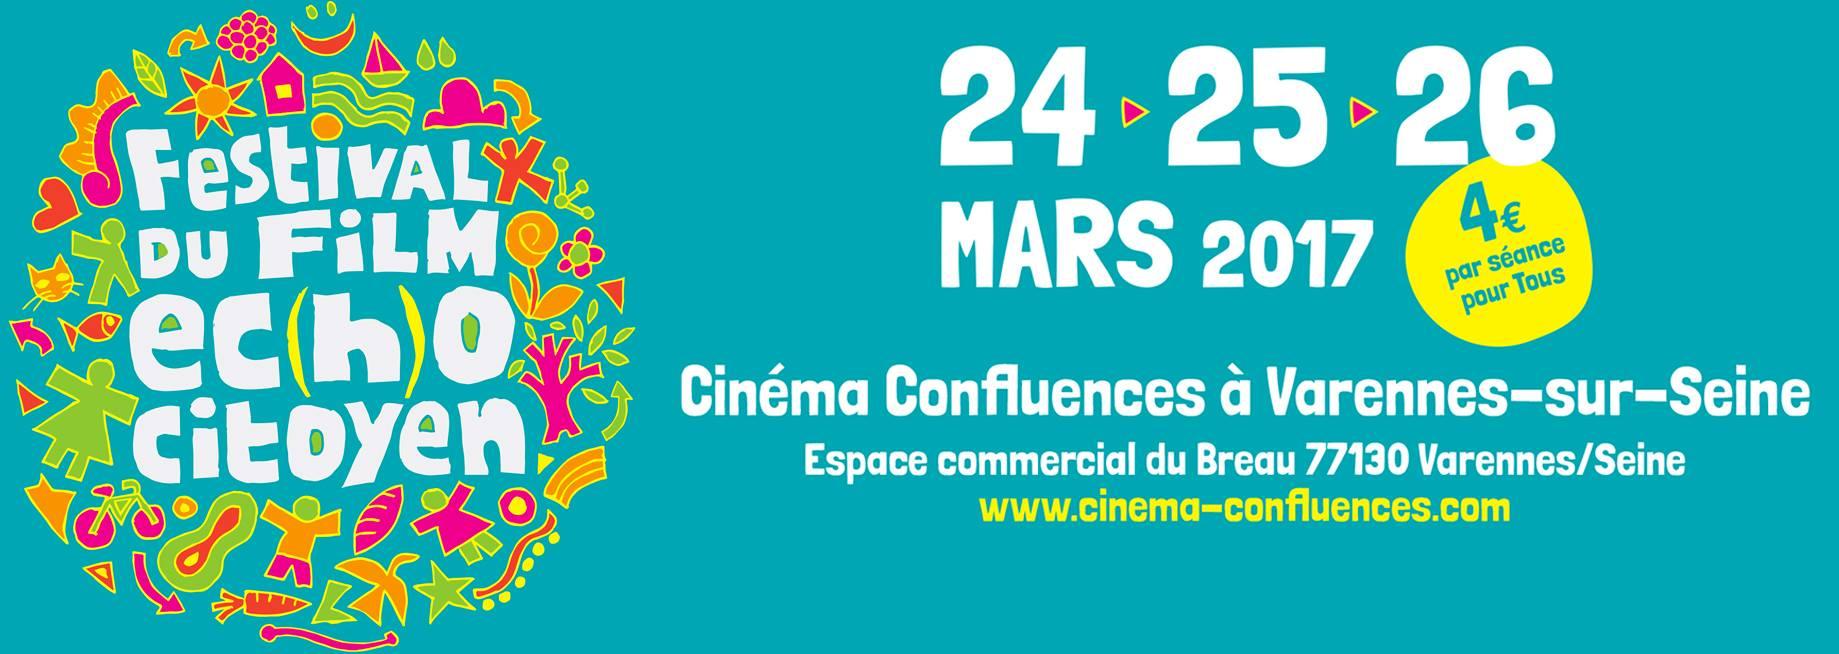 Festival du film Ec(h)o Citoyen